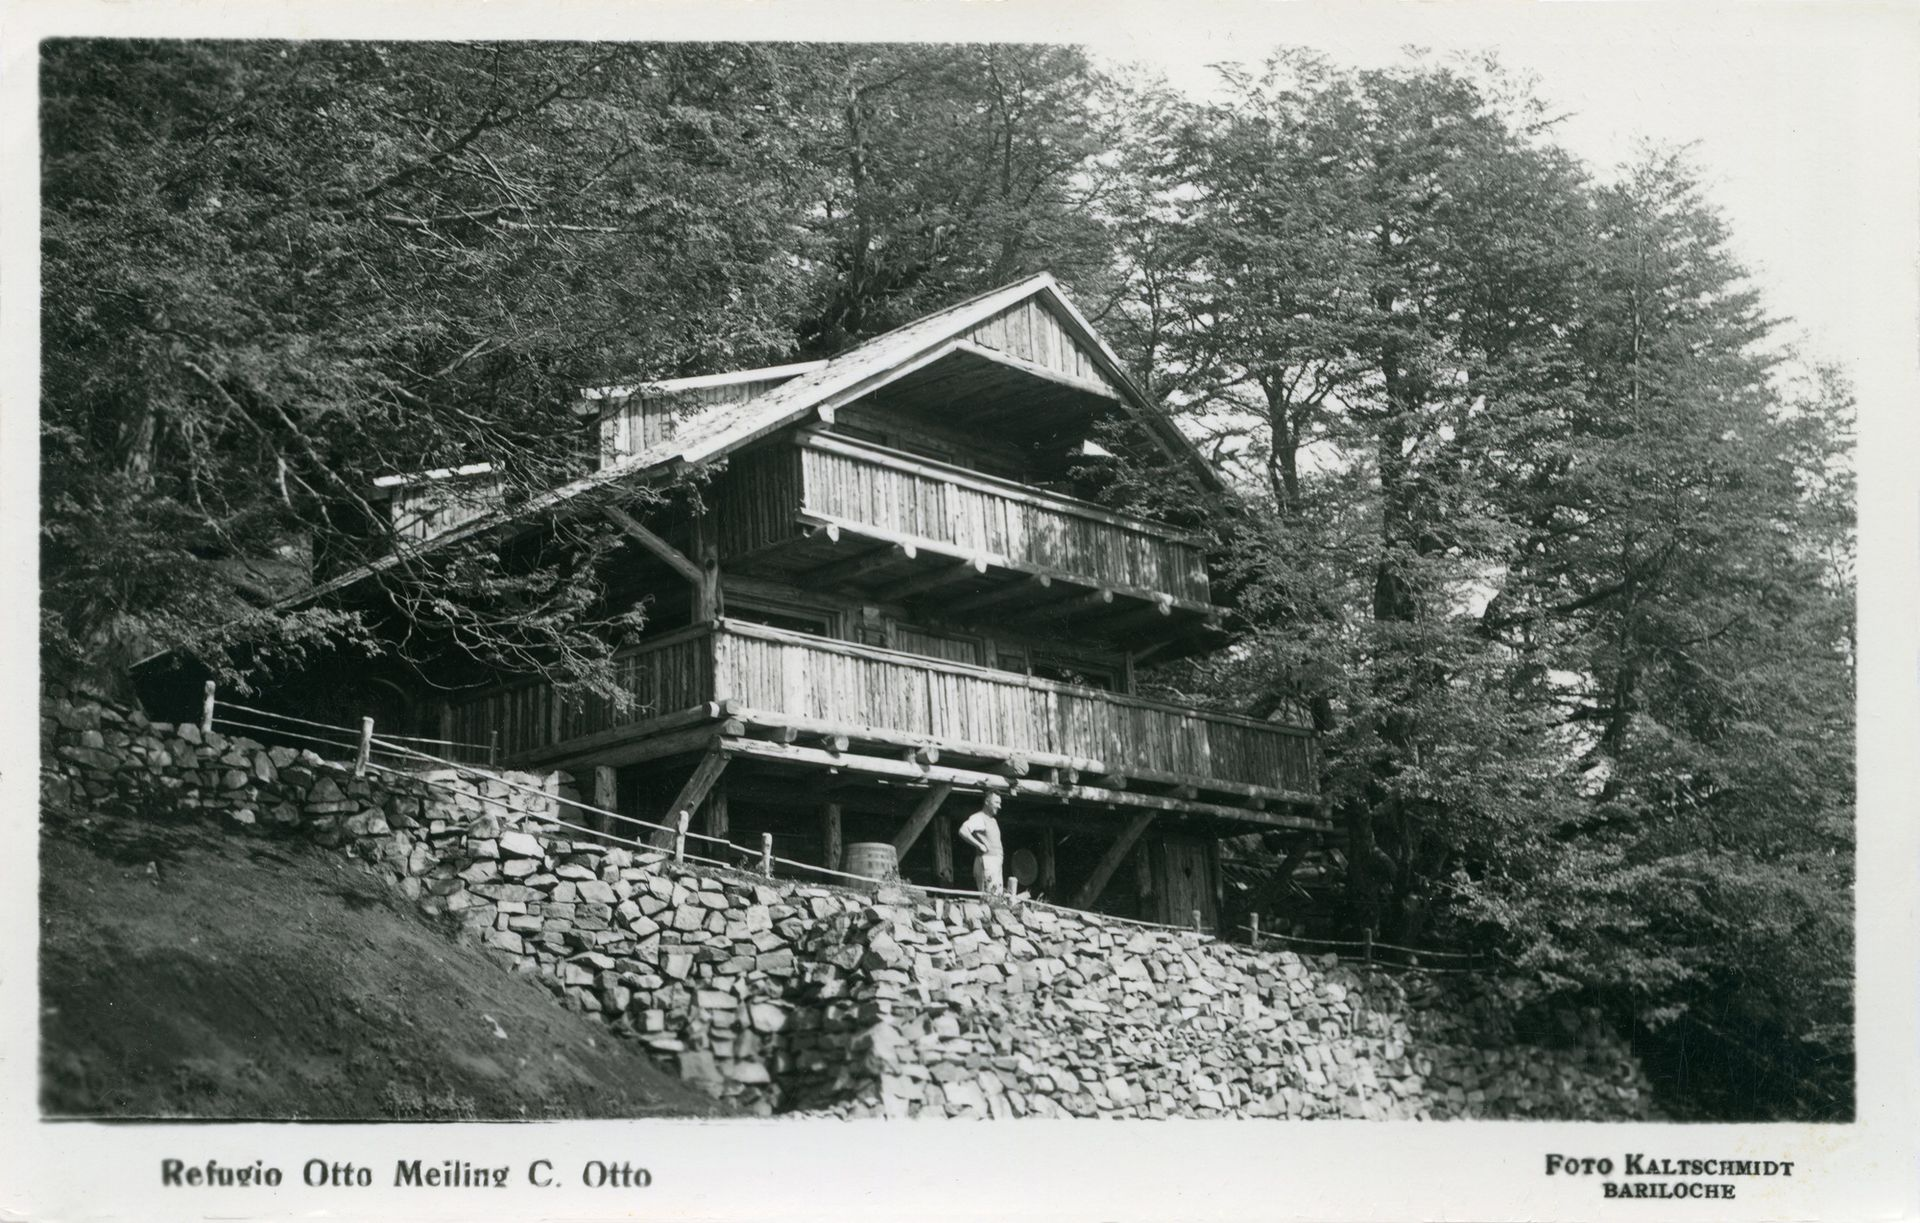 Refugio de Otto Meiling. circa 1940.